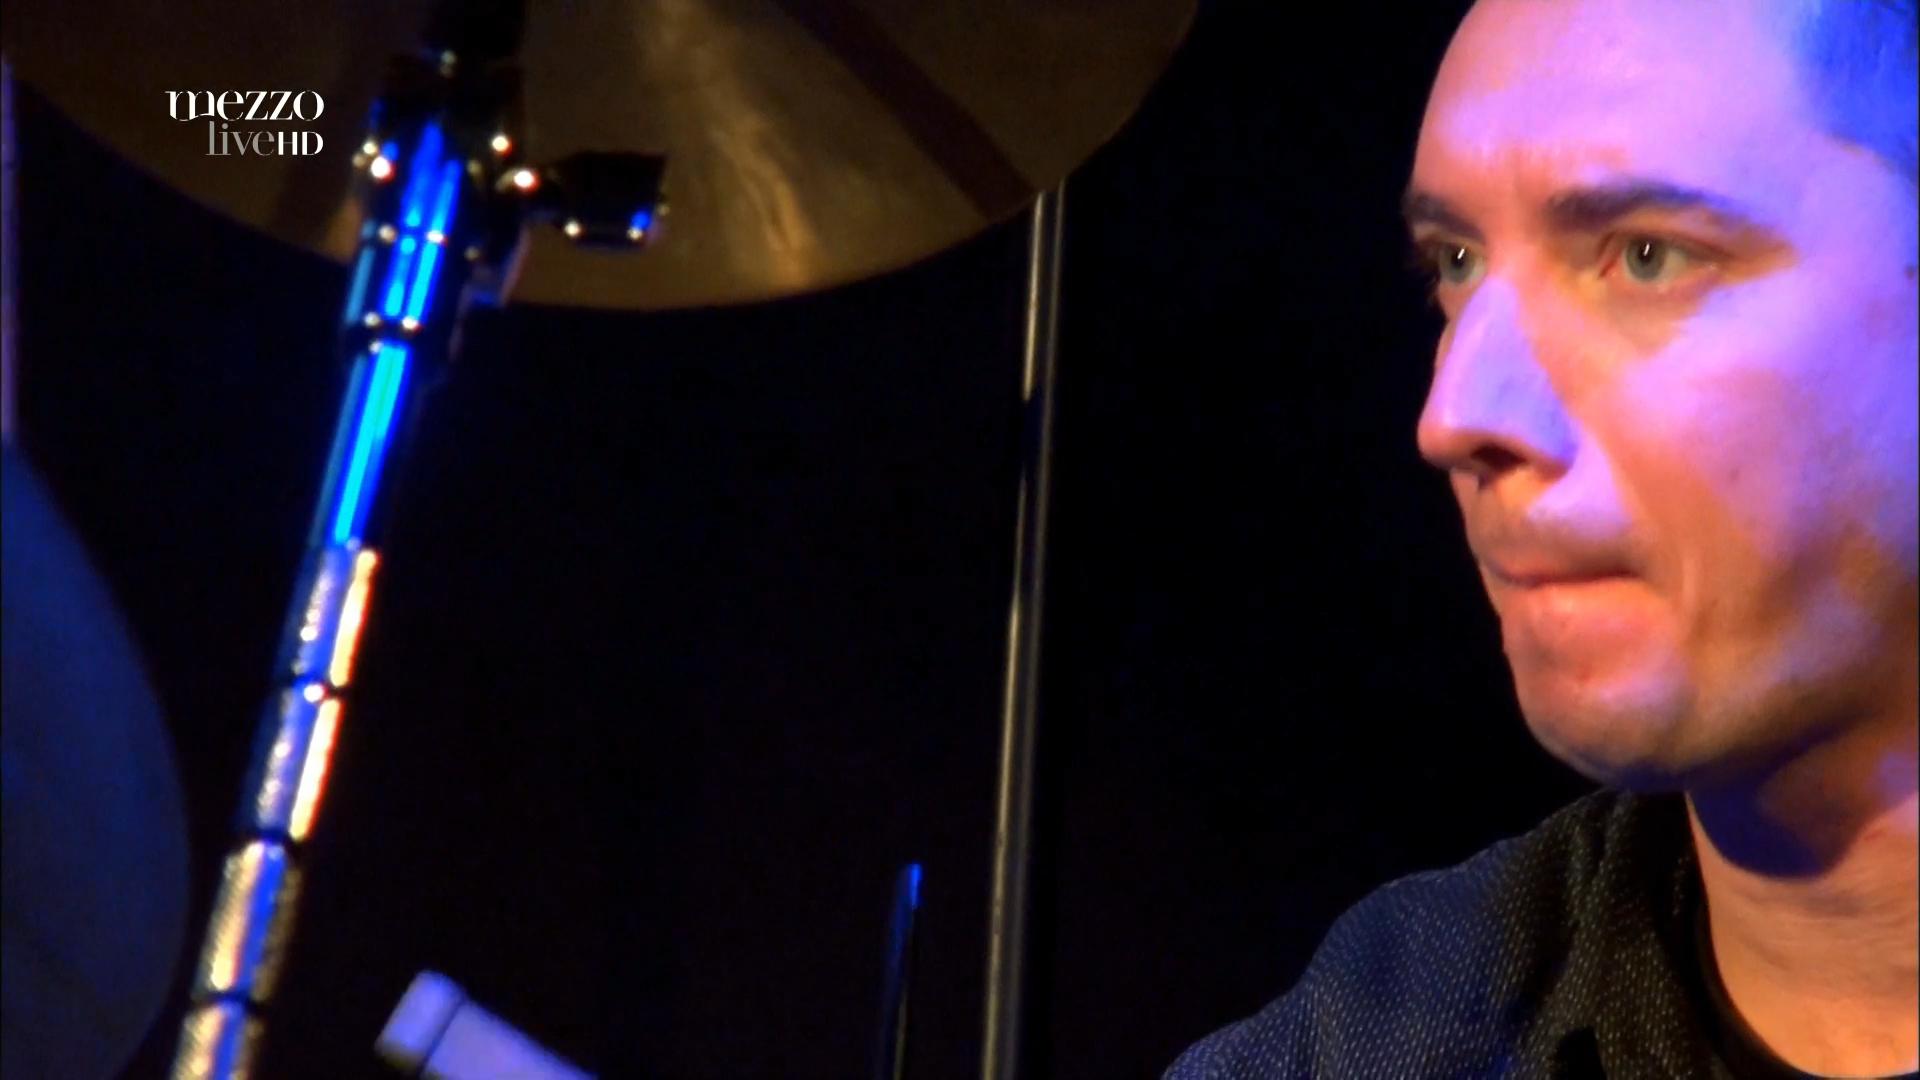 2012 Tomasz Stanko Quartet - Club Jazz L' F [HDTV 1080i] 5